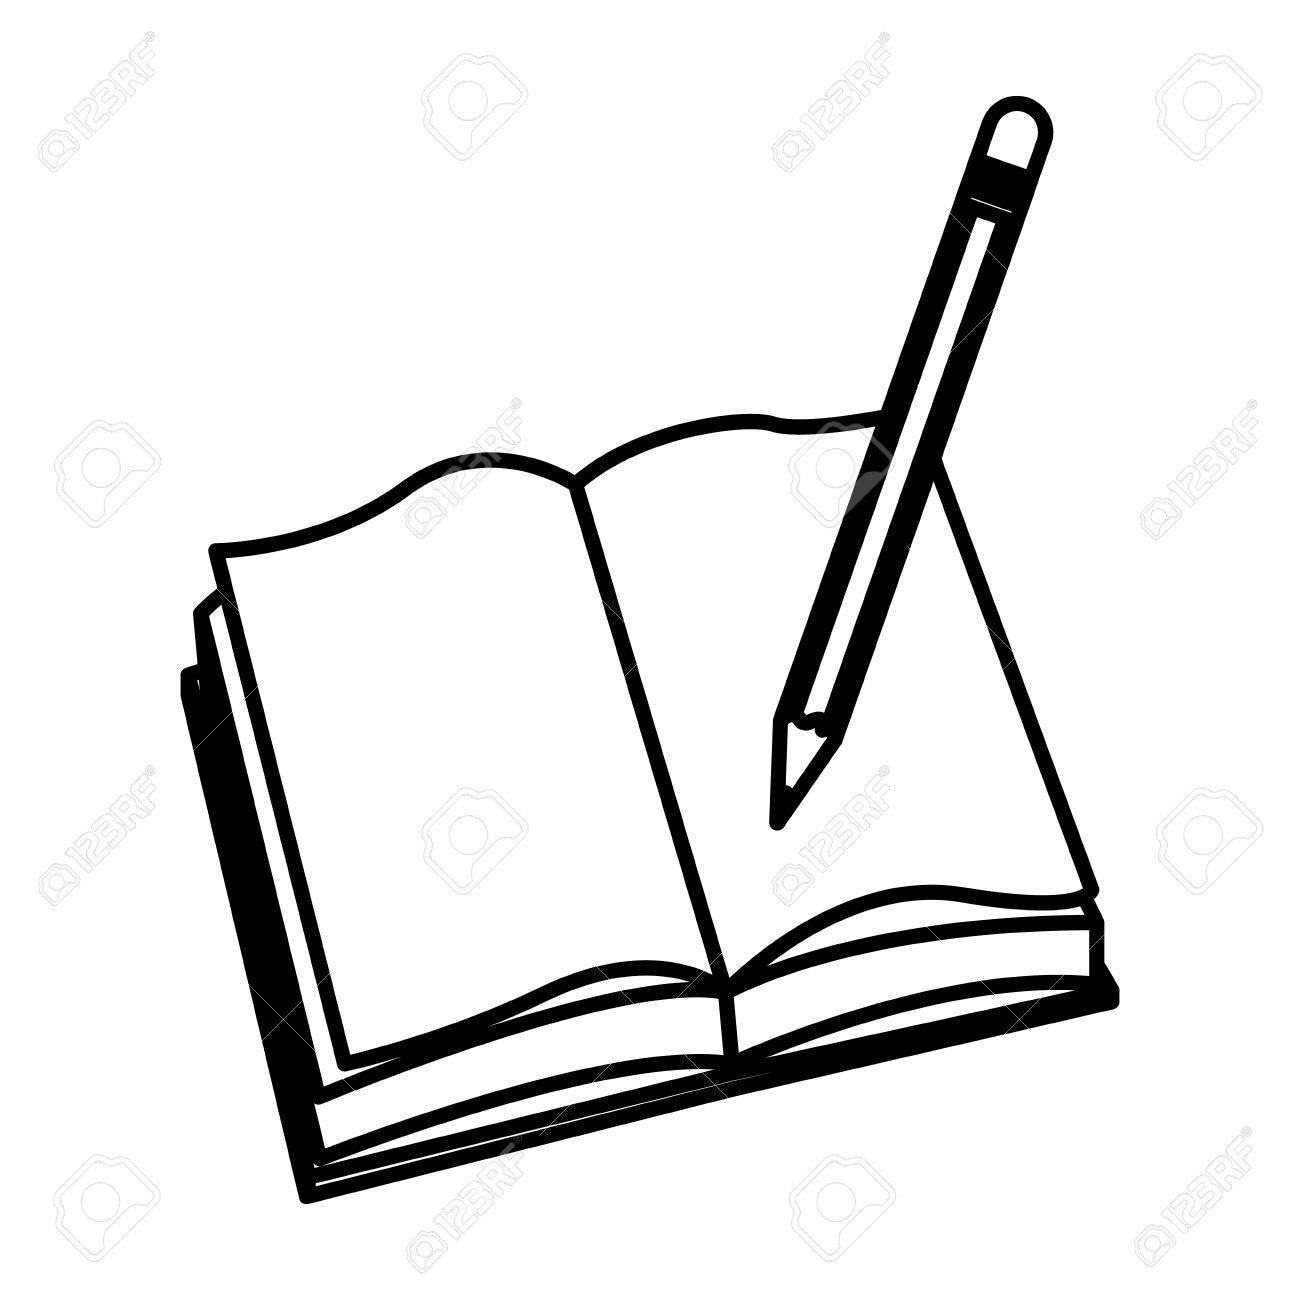 Pencil And Paper Drawing At Getdrawings